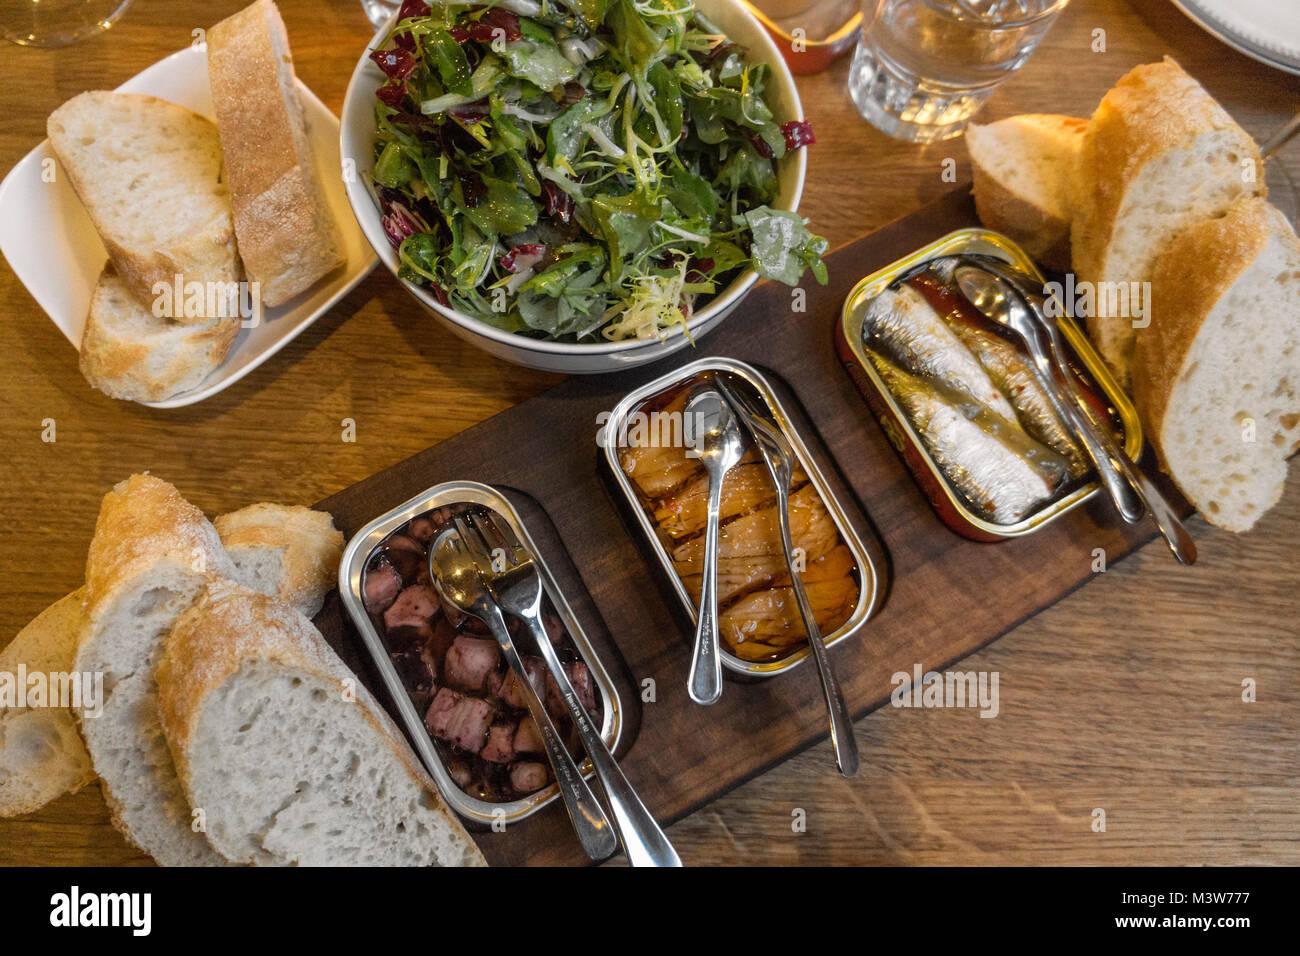 Sardinenbar, Fischkonserven für Gourmets, Restaurant, Schöneberg, Berlin, | Sardinenbar, gourmet fish - Stock Image